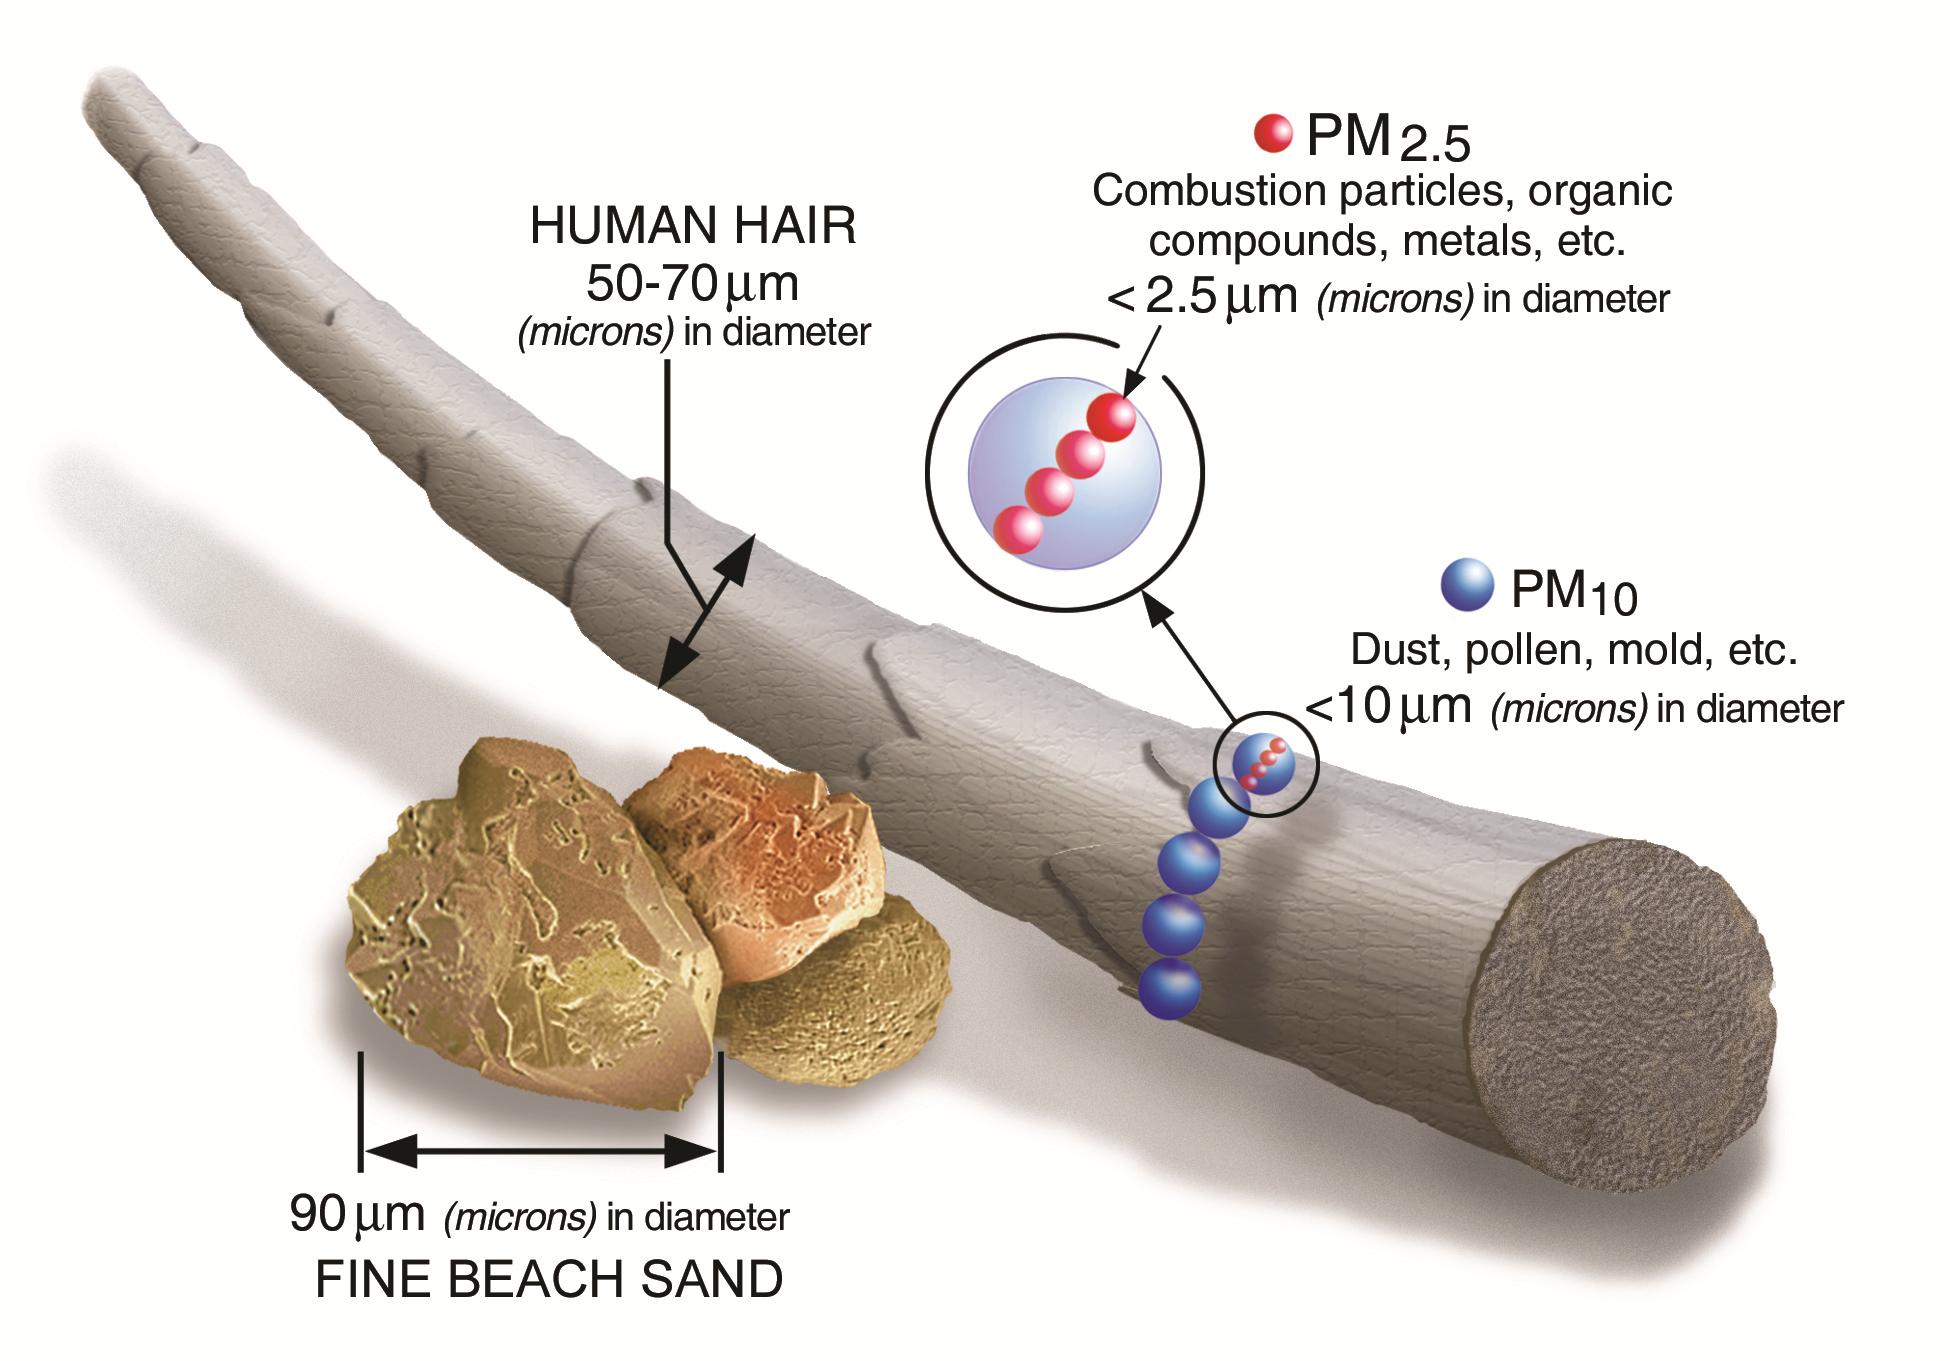 Illustration of PM25